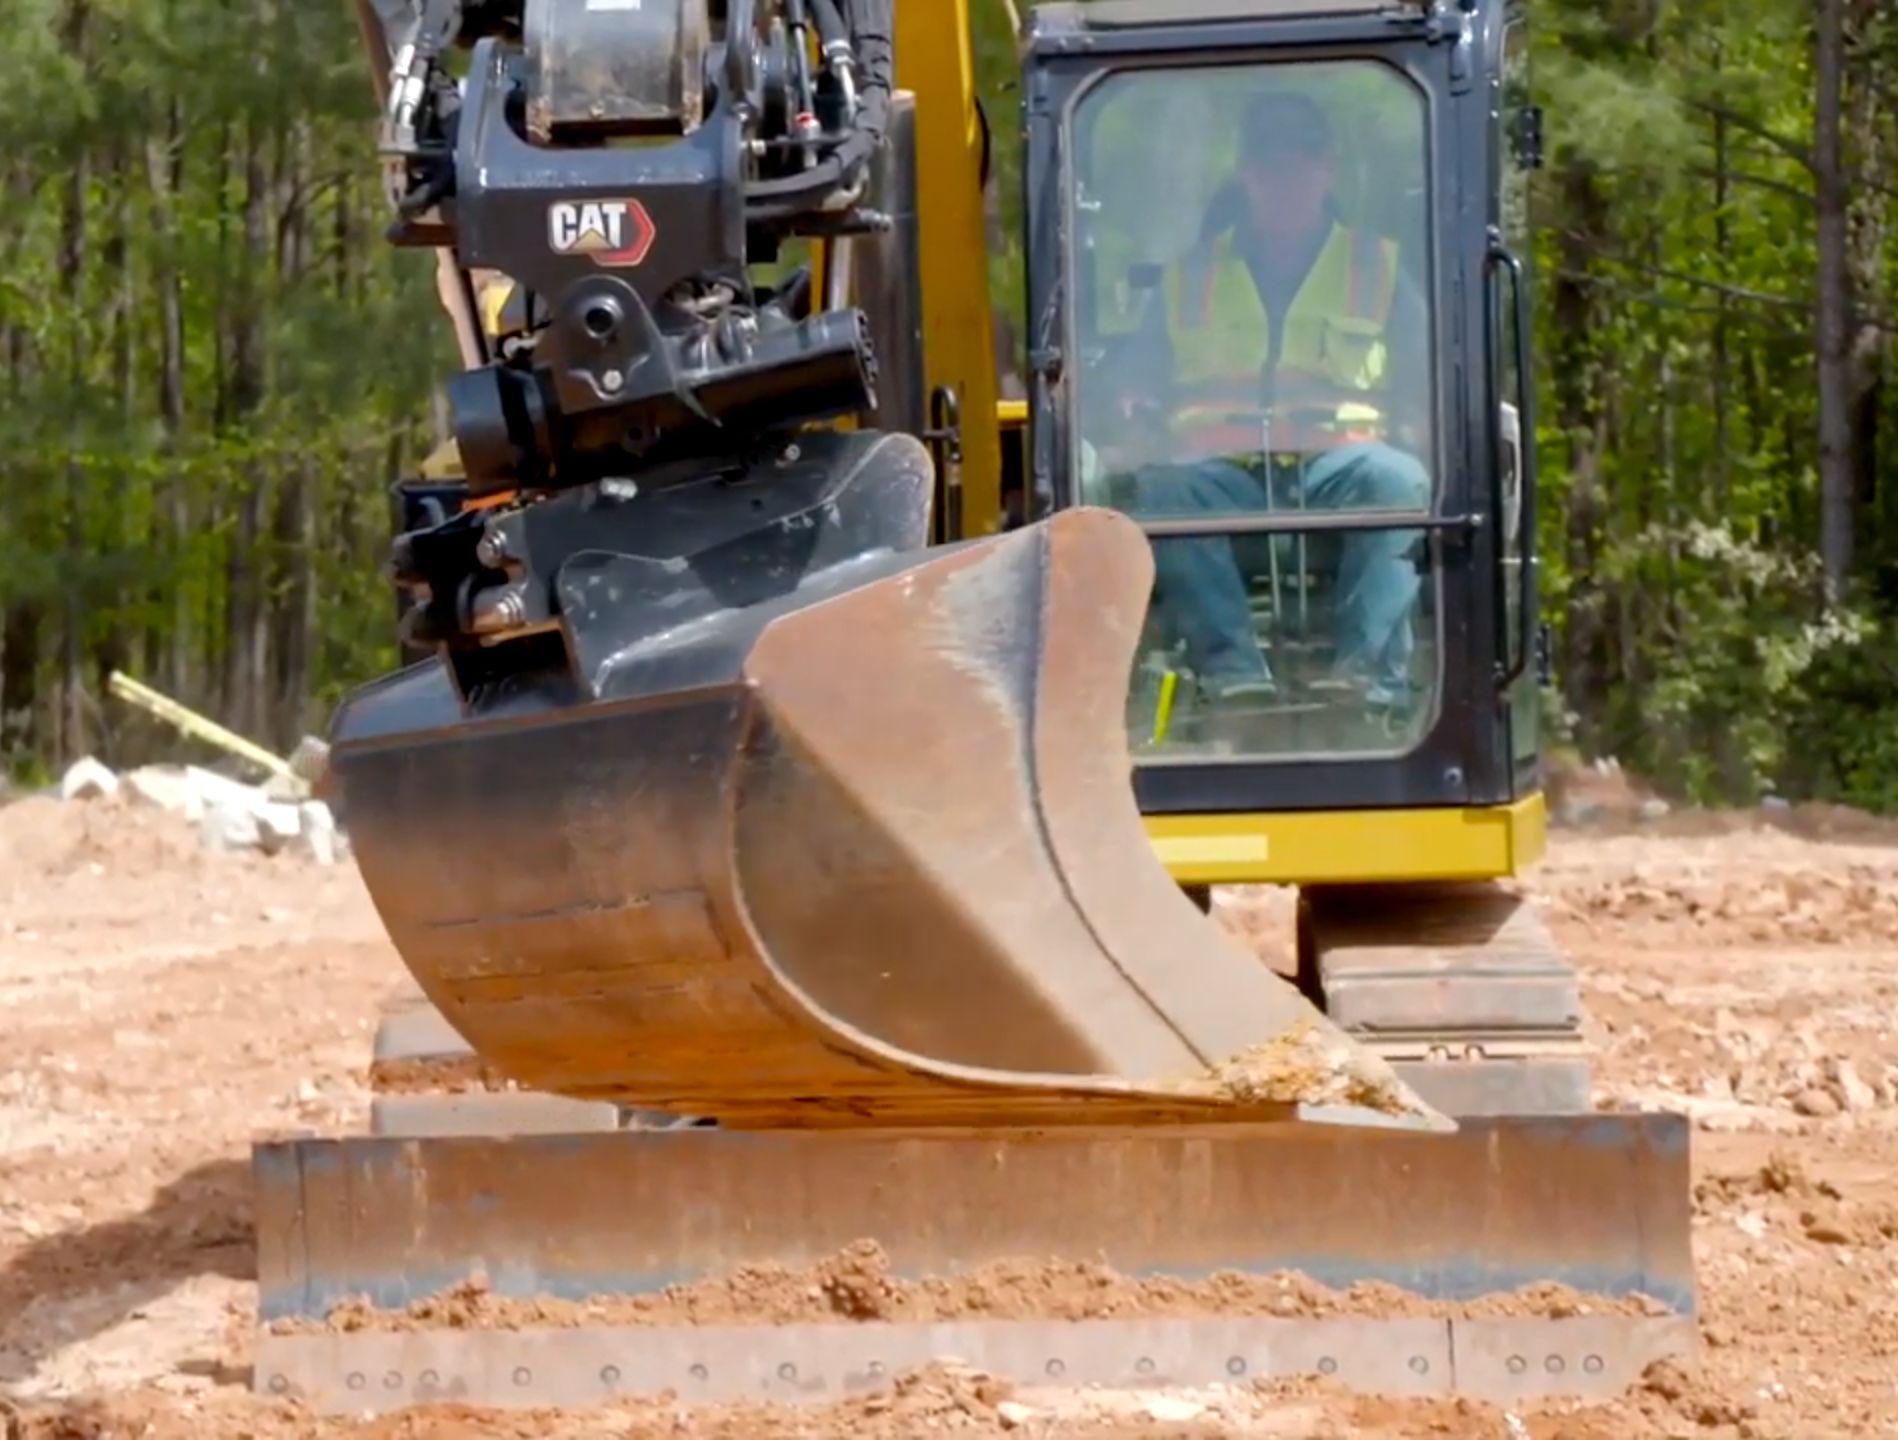 Next Generation Mini Excavators are TRS Ready